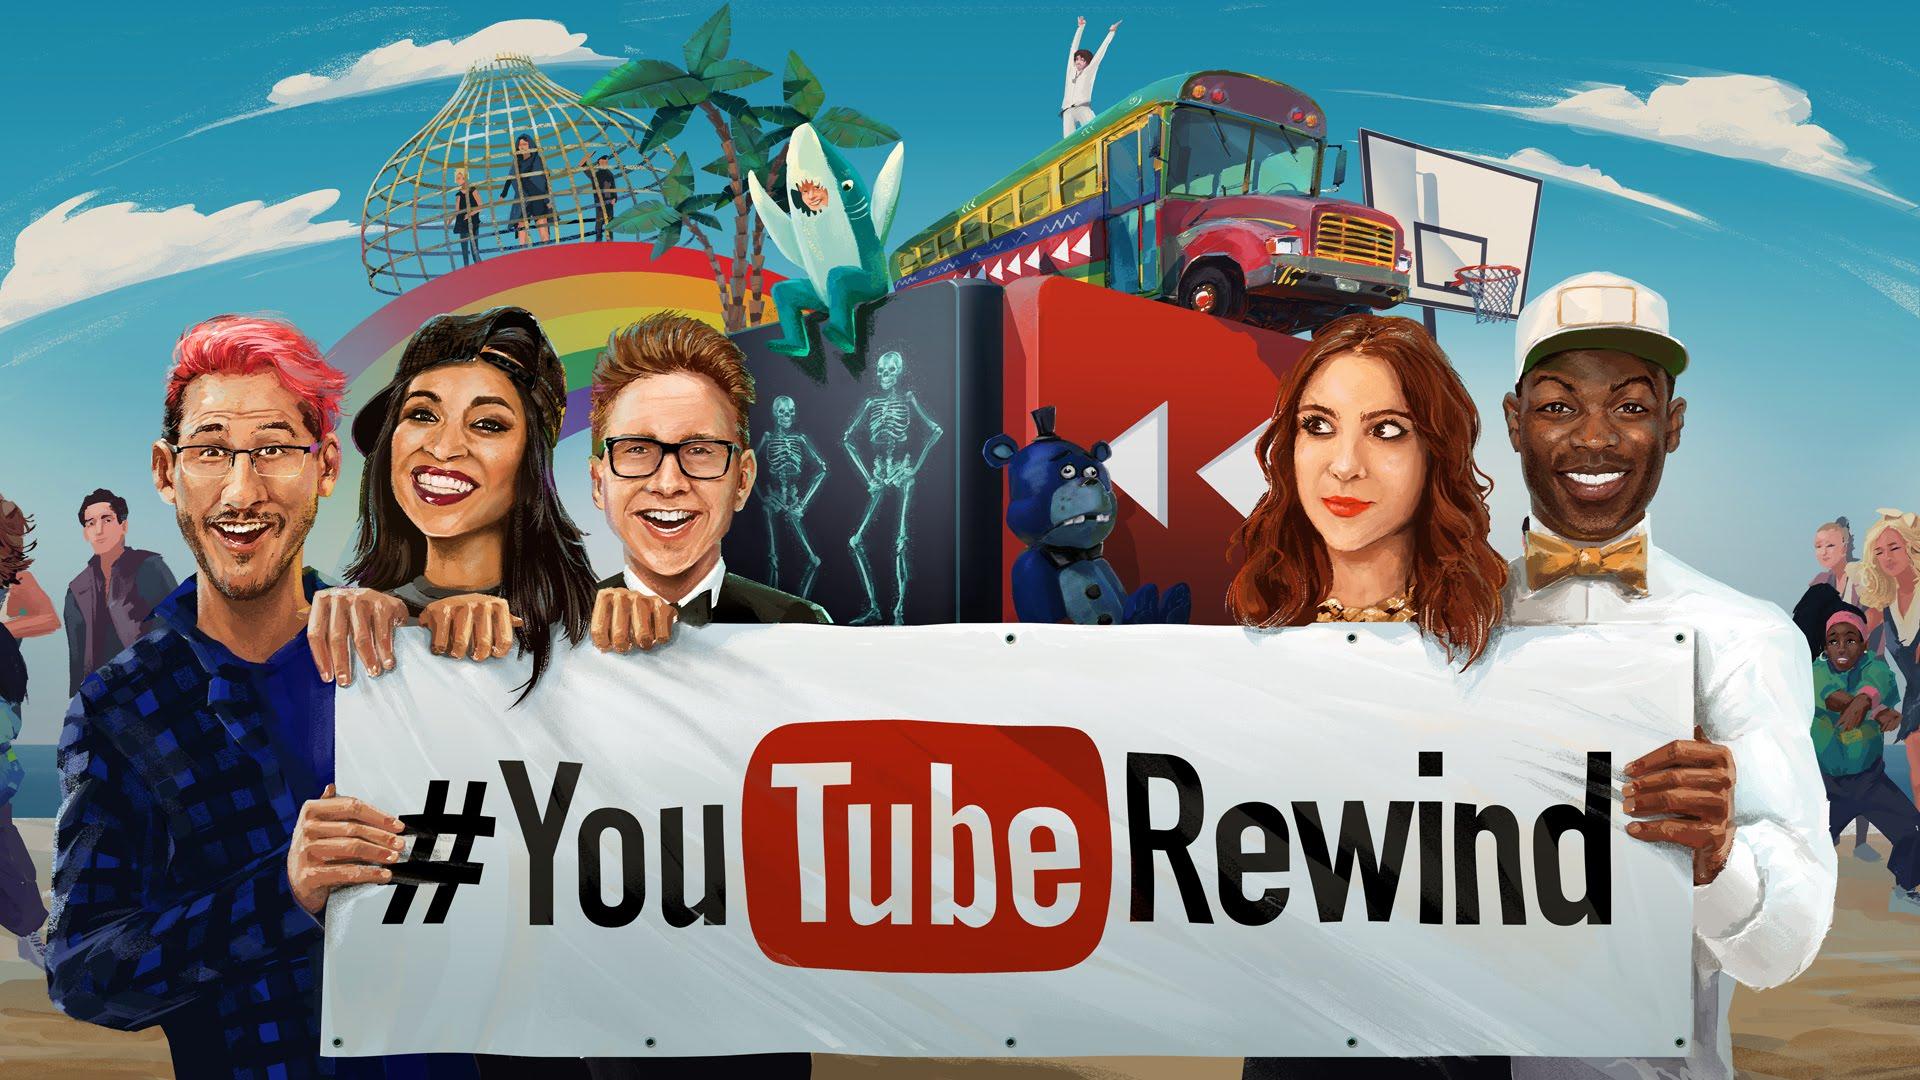 #YouTubeRewind 2015: Un año en YouTube